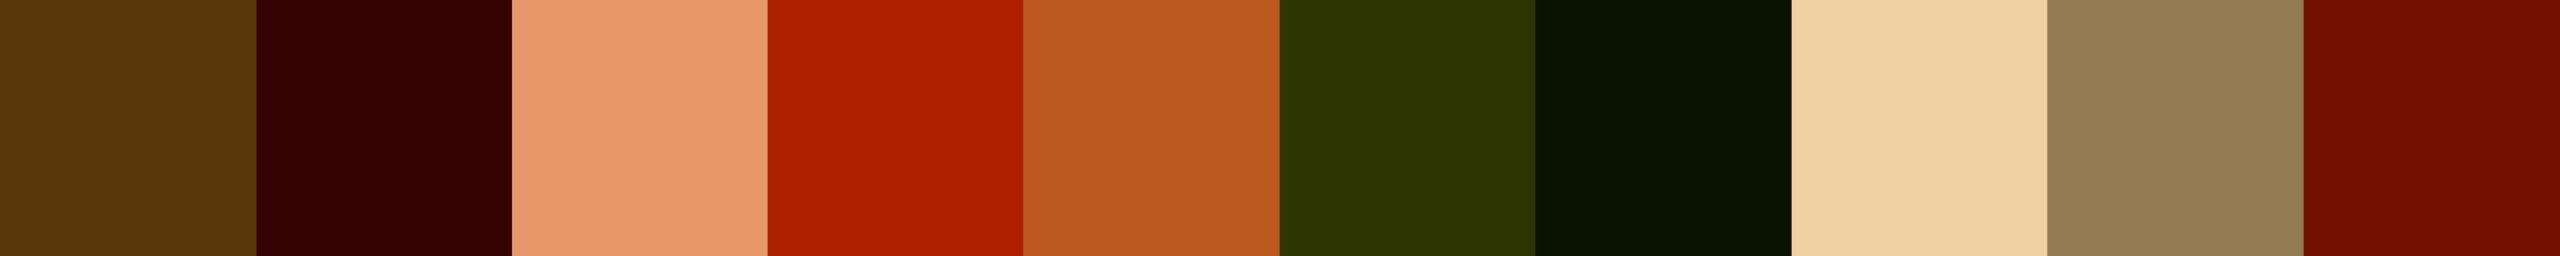 47 Moreda Color Palette